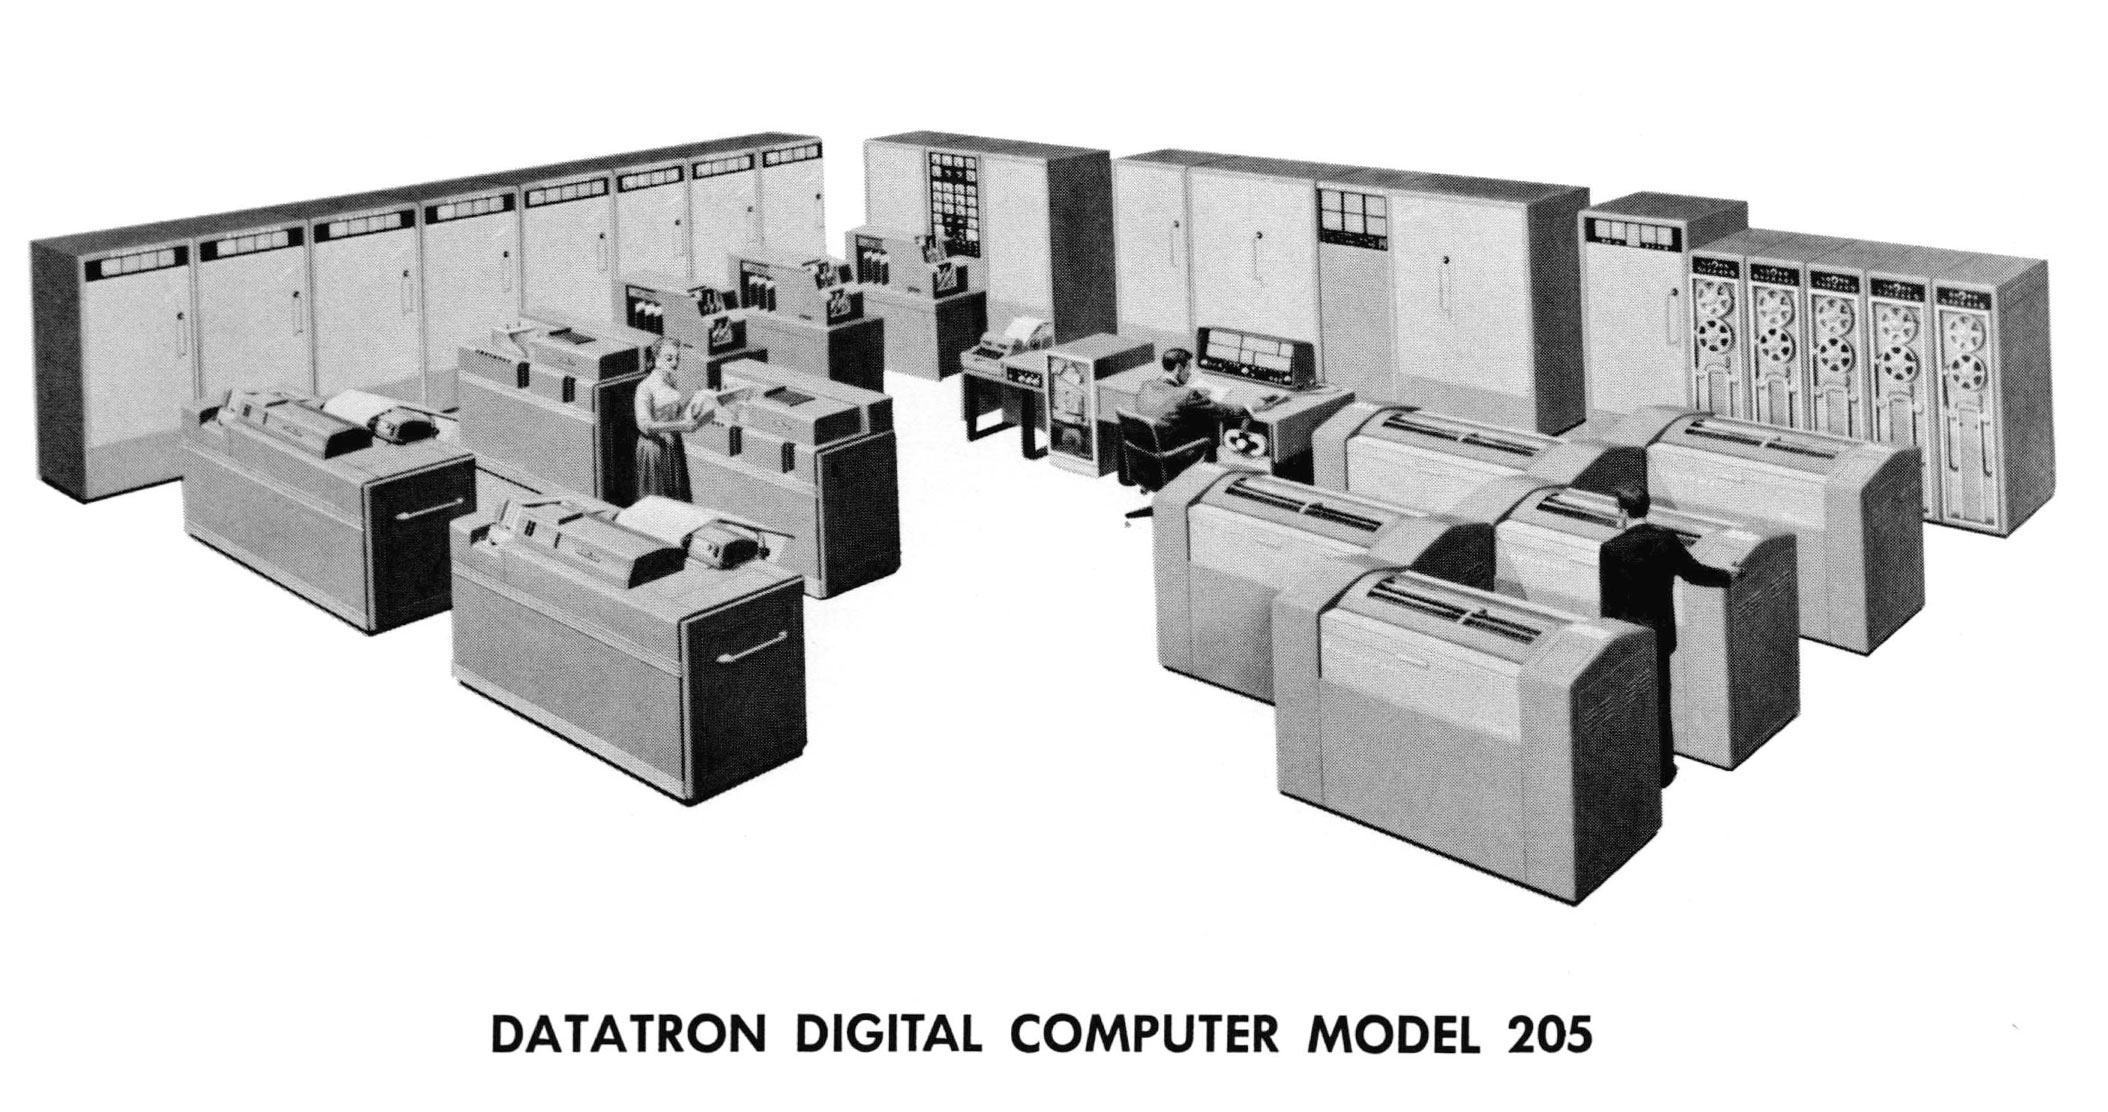 Datatron 205